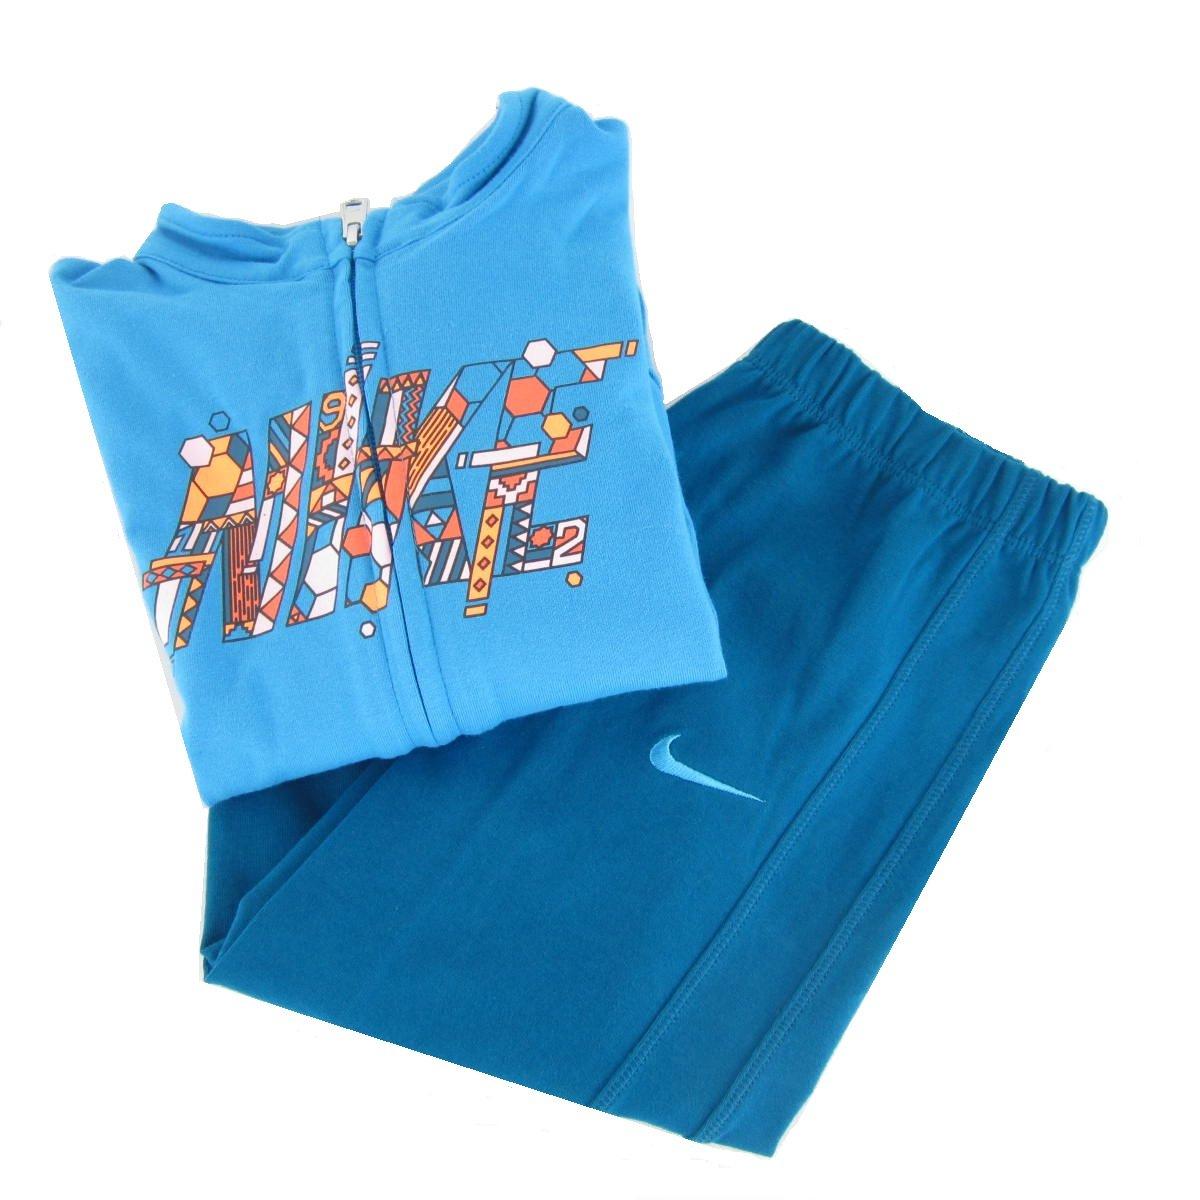 Nike Dri Fit Victory Stripe Golf Polo 2019 Obsidian/Deep Royal Blue/Flat Silver Small